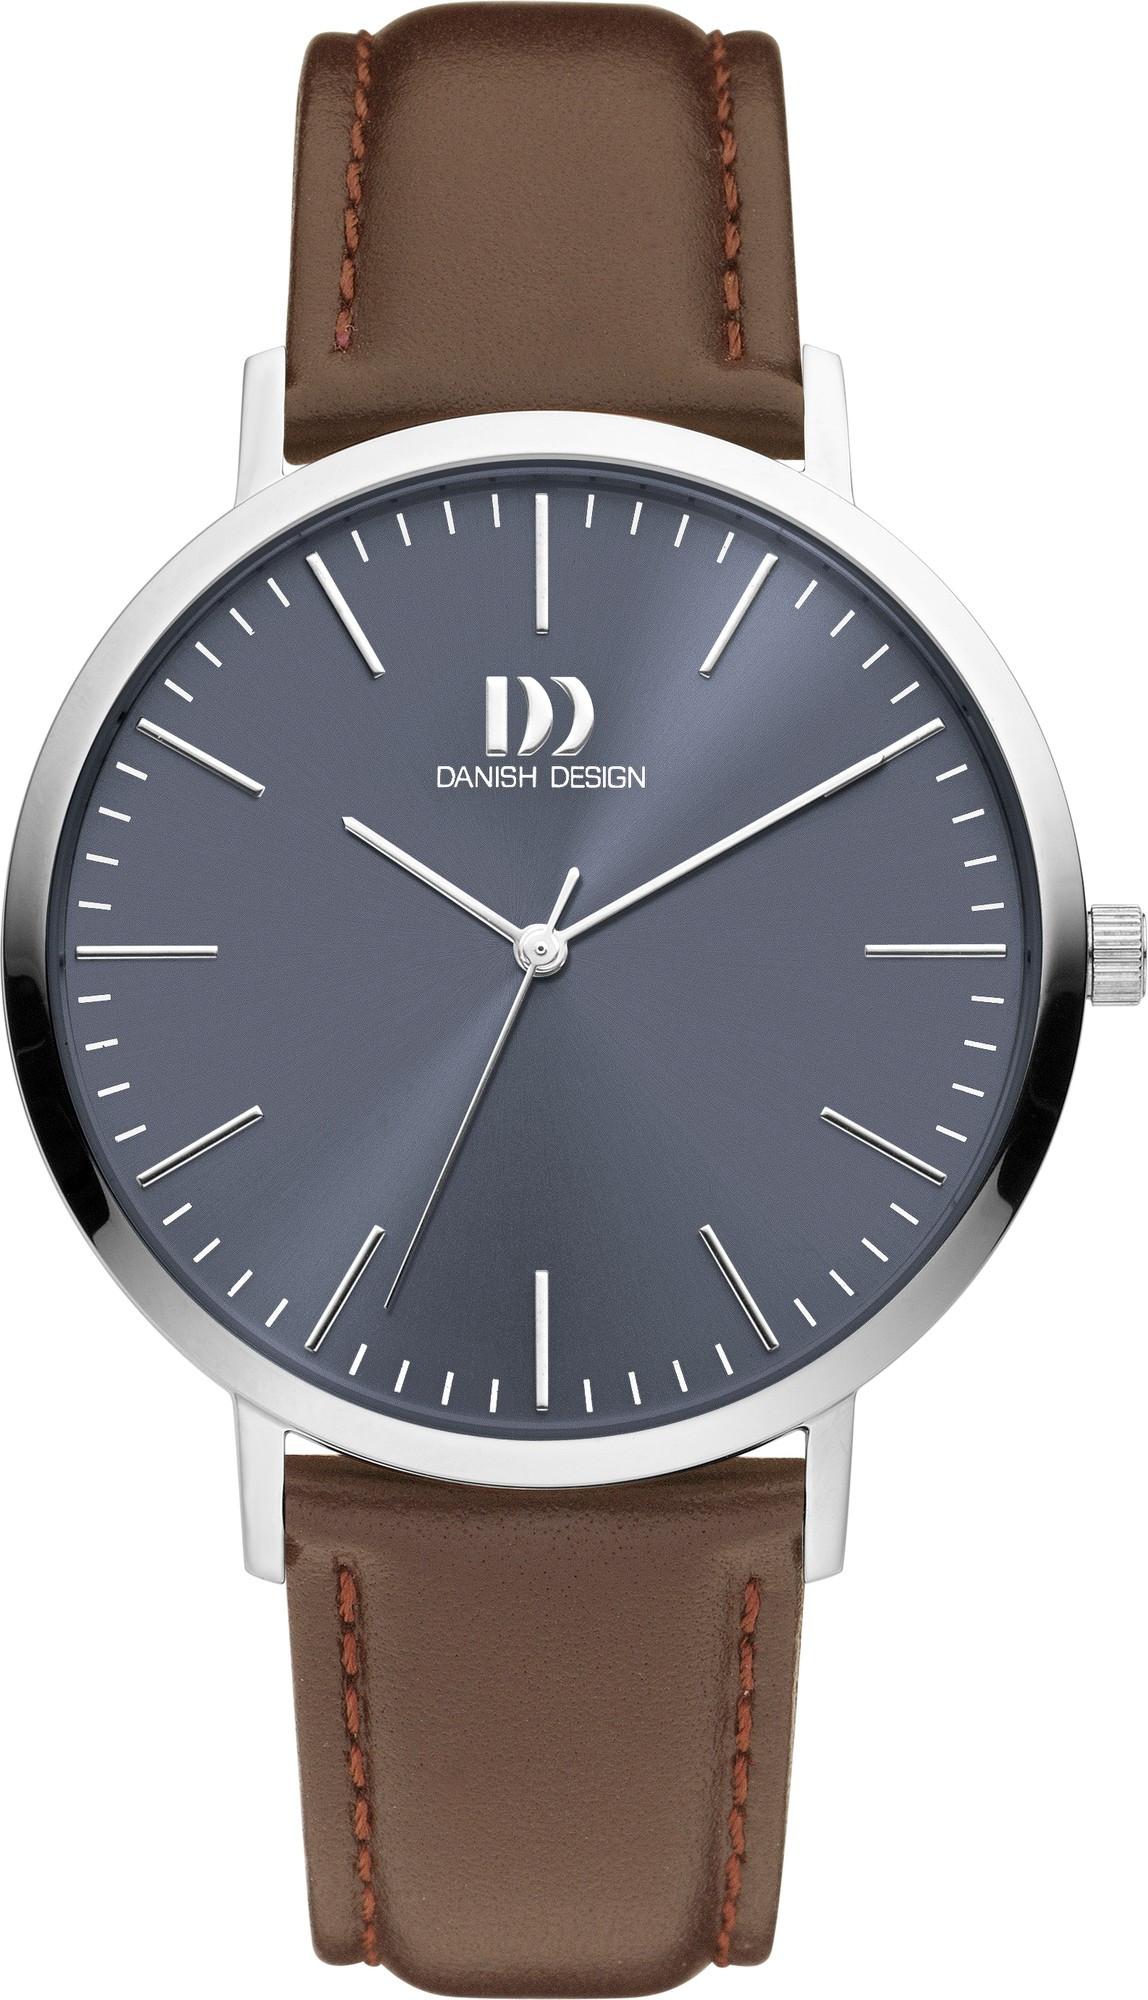 Danish Design IQ22Q1159